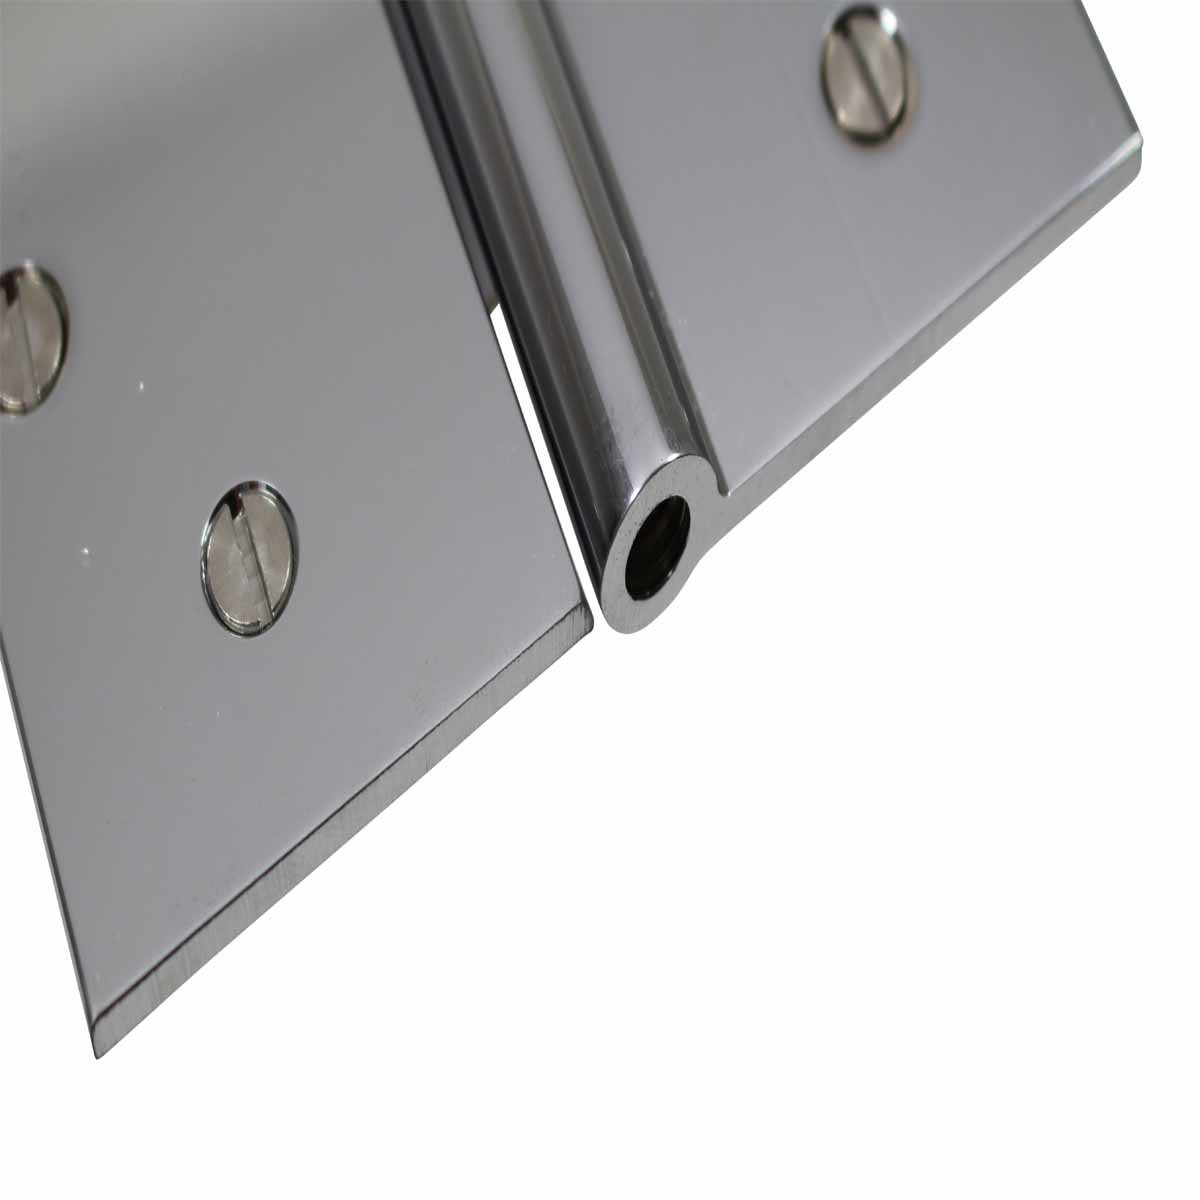 5 Square Door Hinge Lift Off Left Chrome Solid Brass Door Hinges Door Hinge Solid Brass Hinge